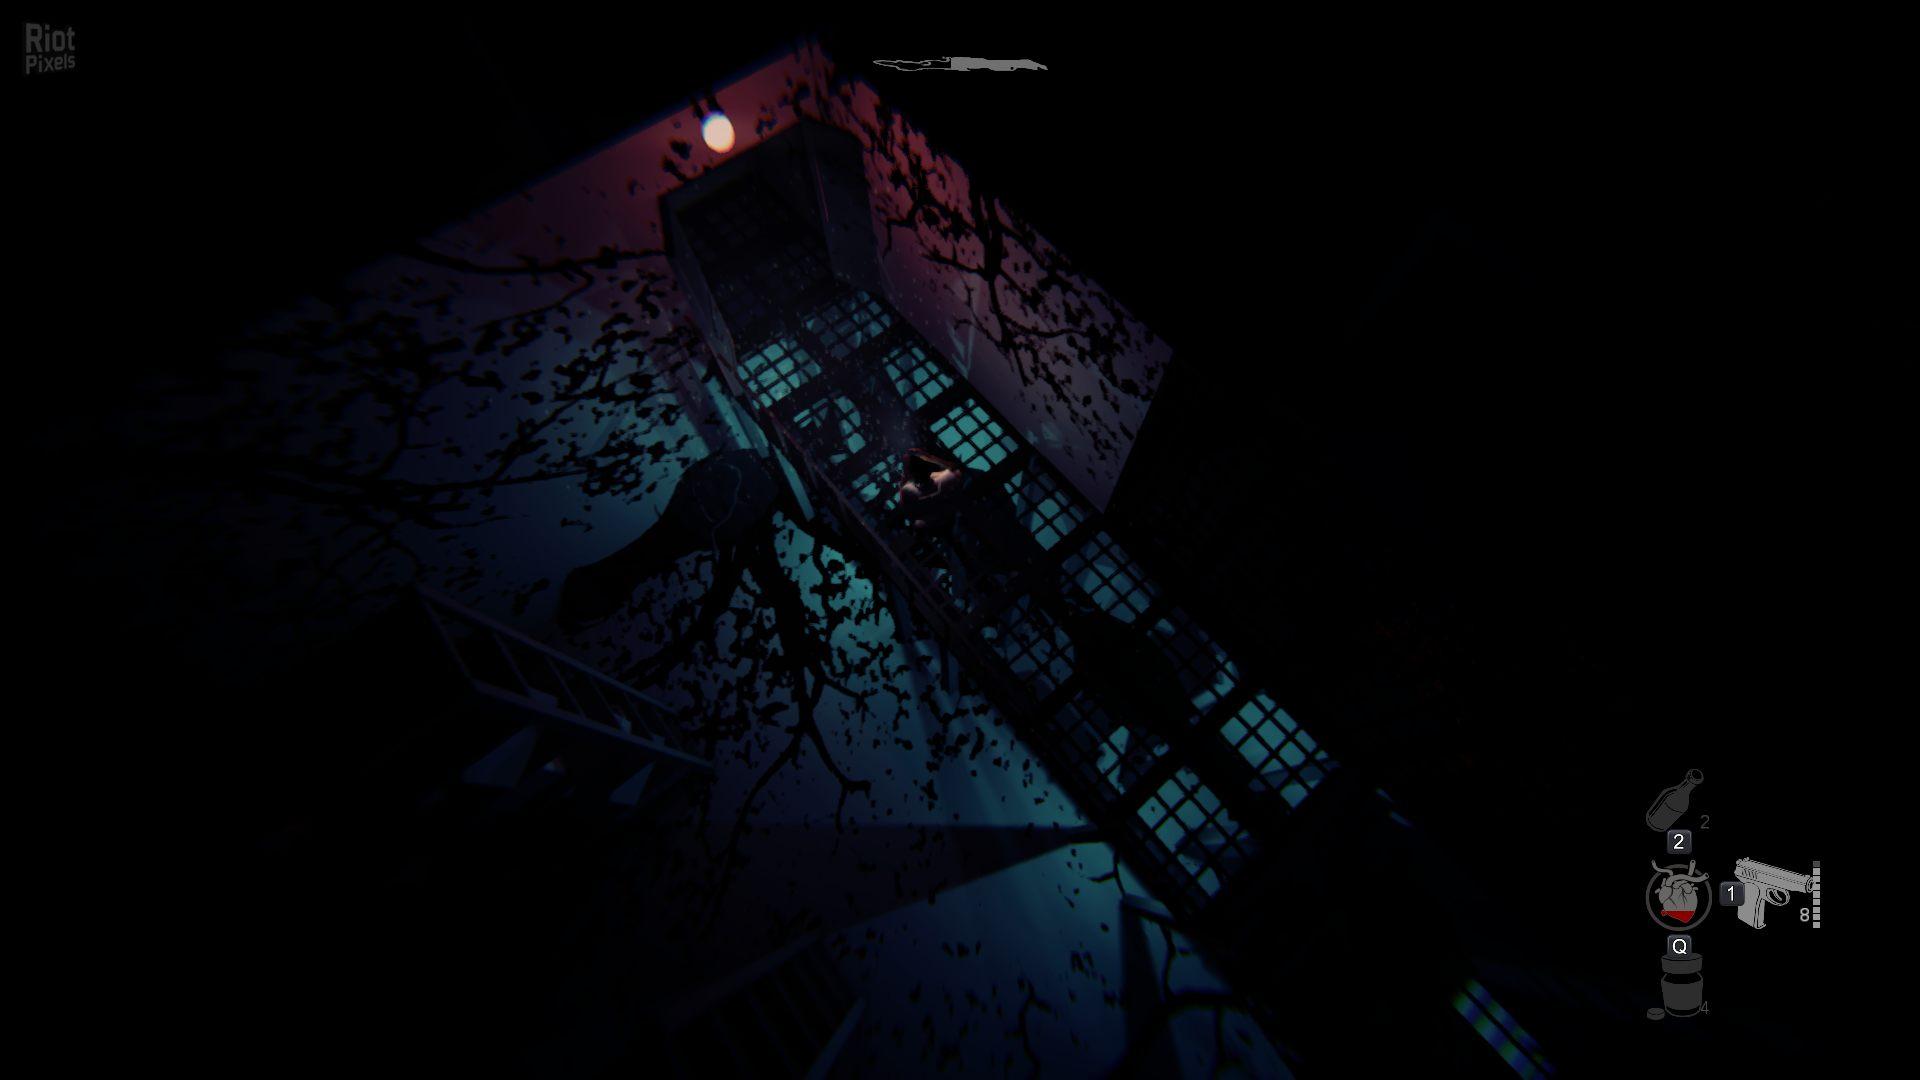 skyhill black mist game screenshot wallpaper 71605